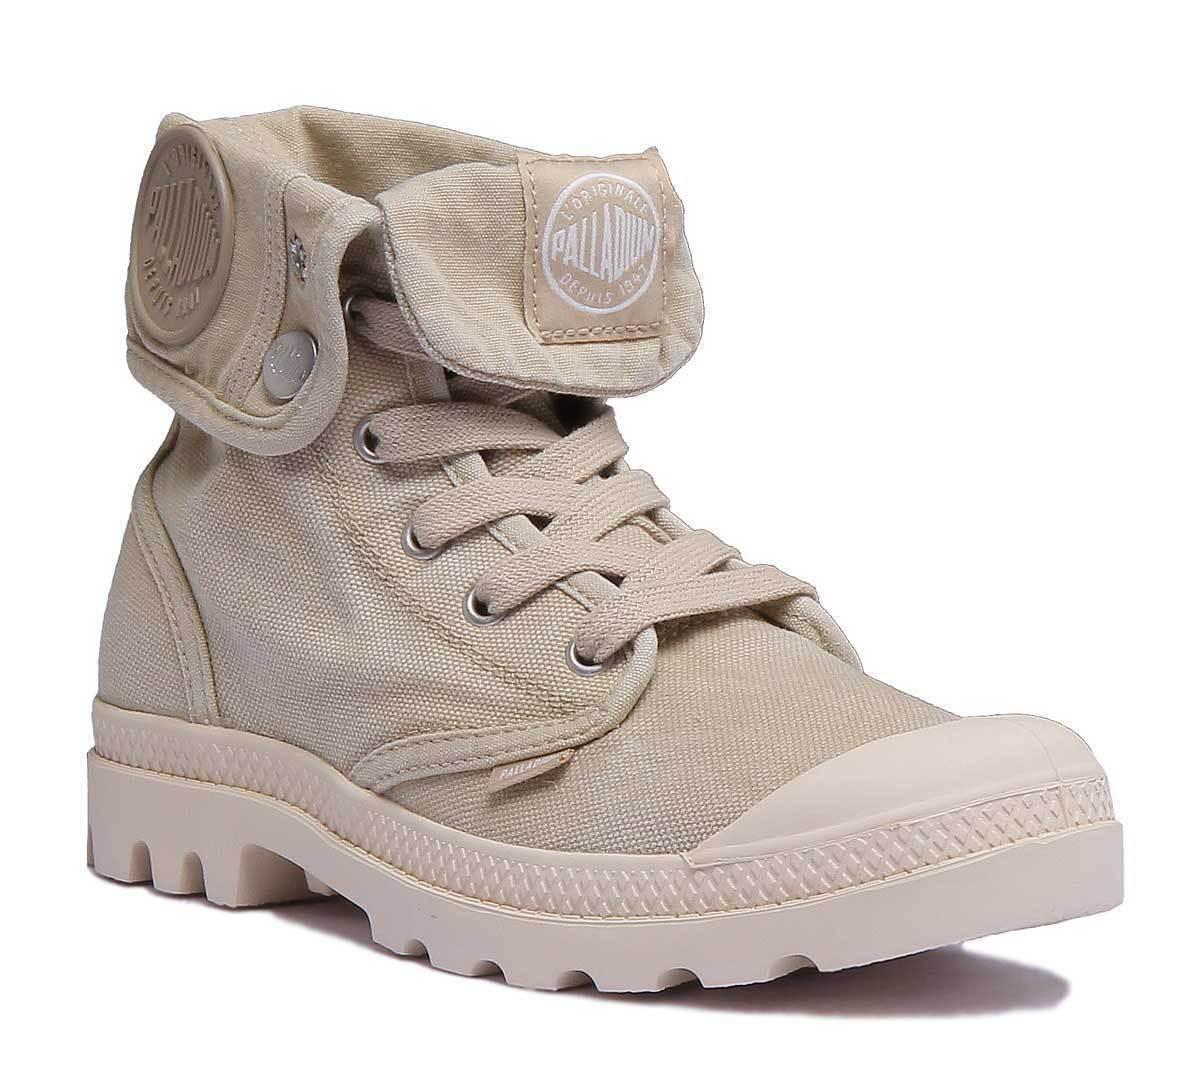 Palladium Us Baggy Womens Khaki Canvas Boots Size UK 3 - 8